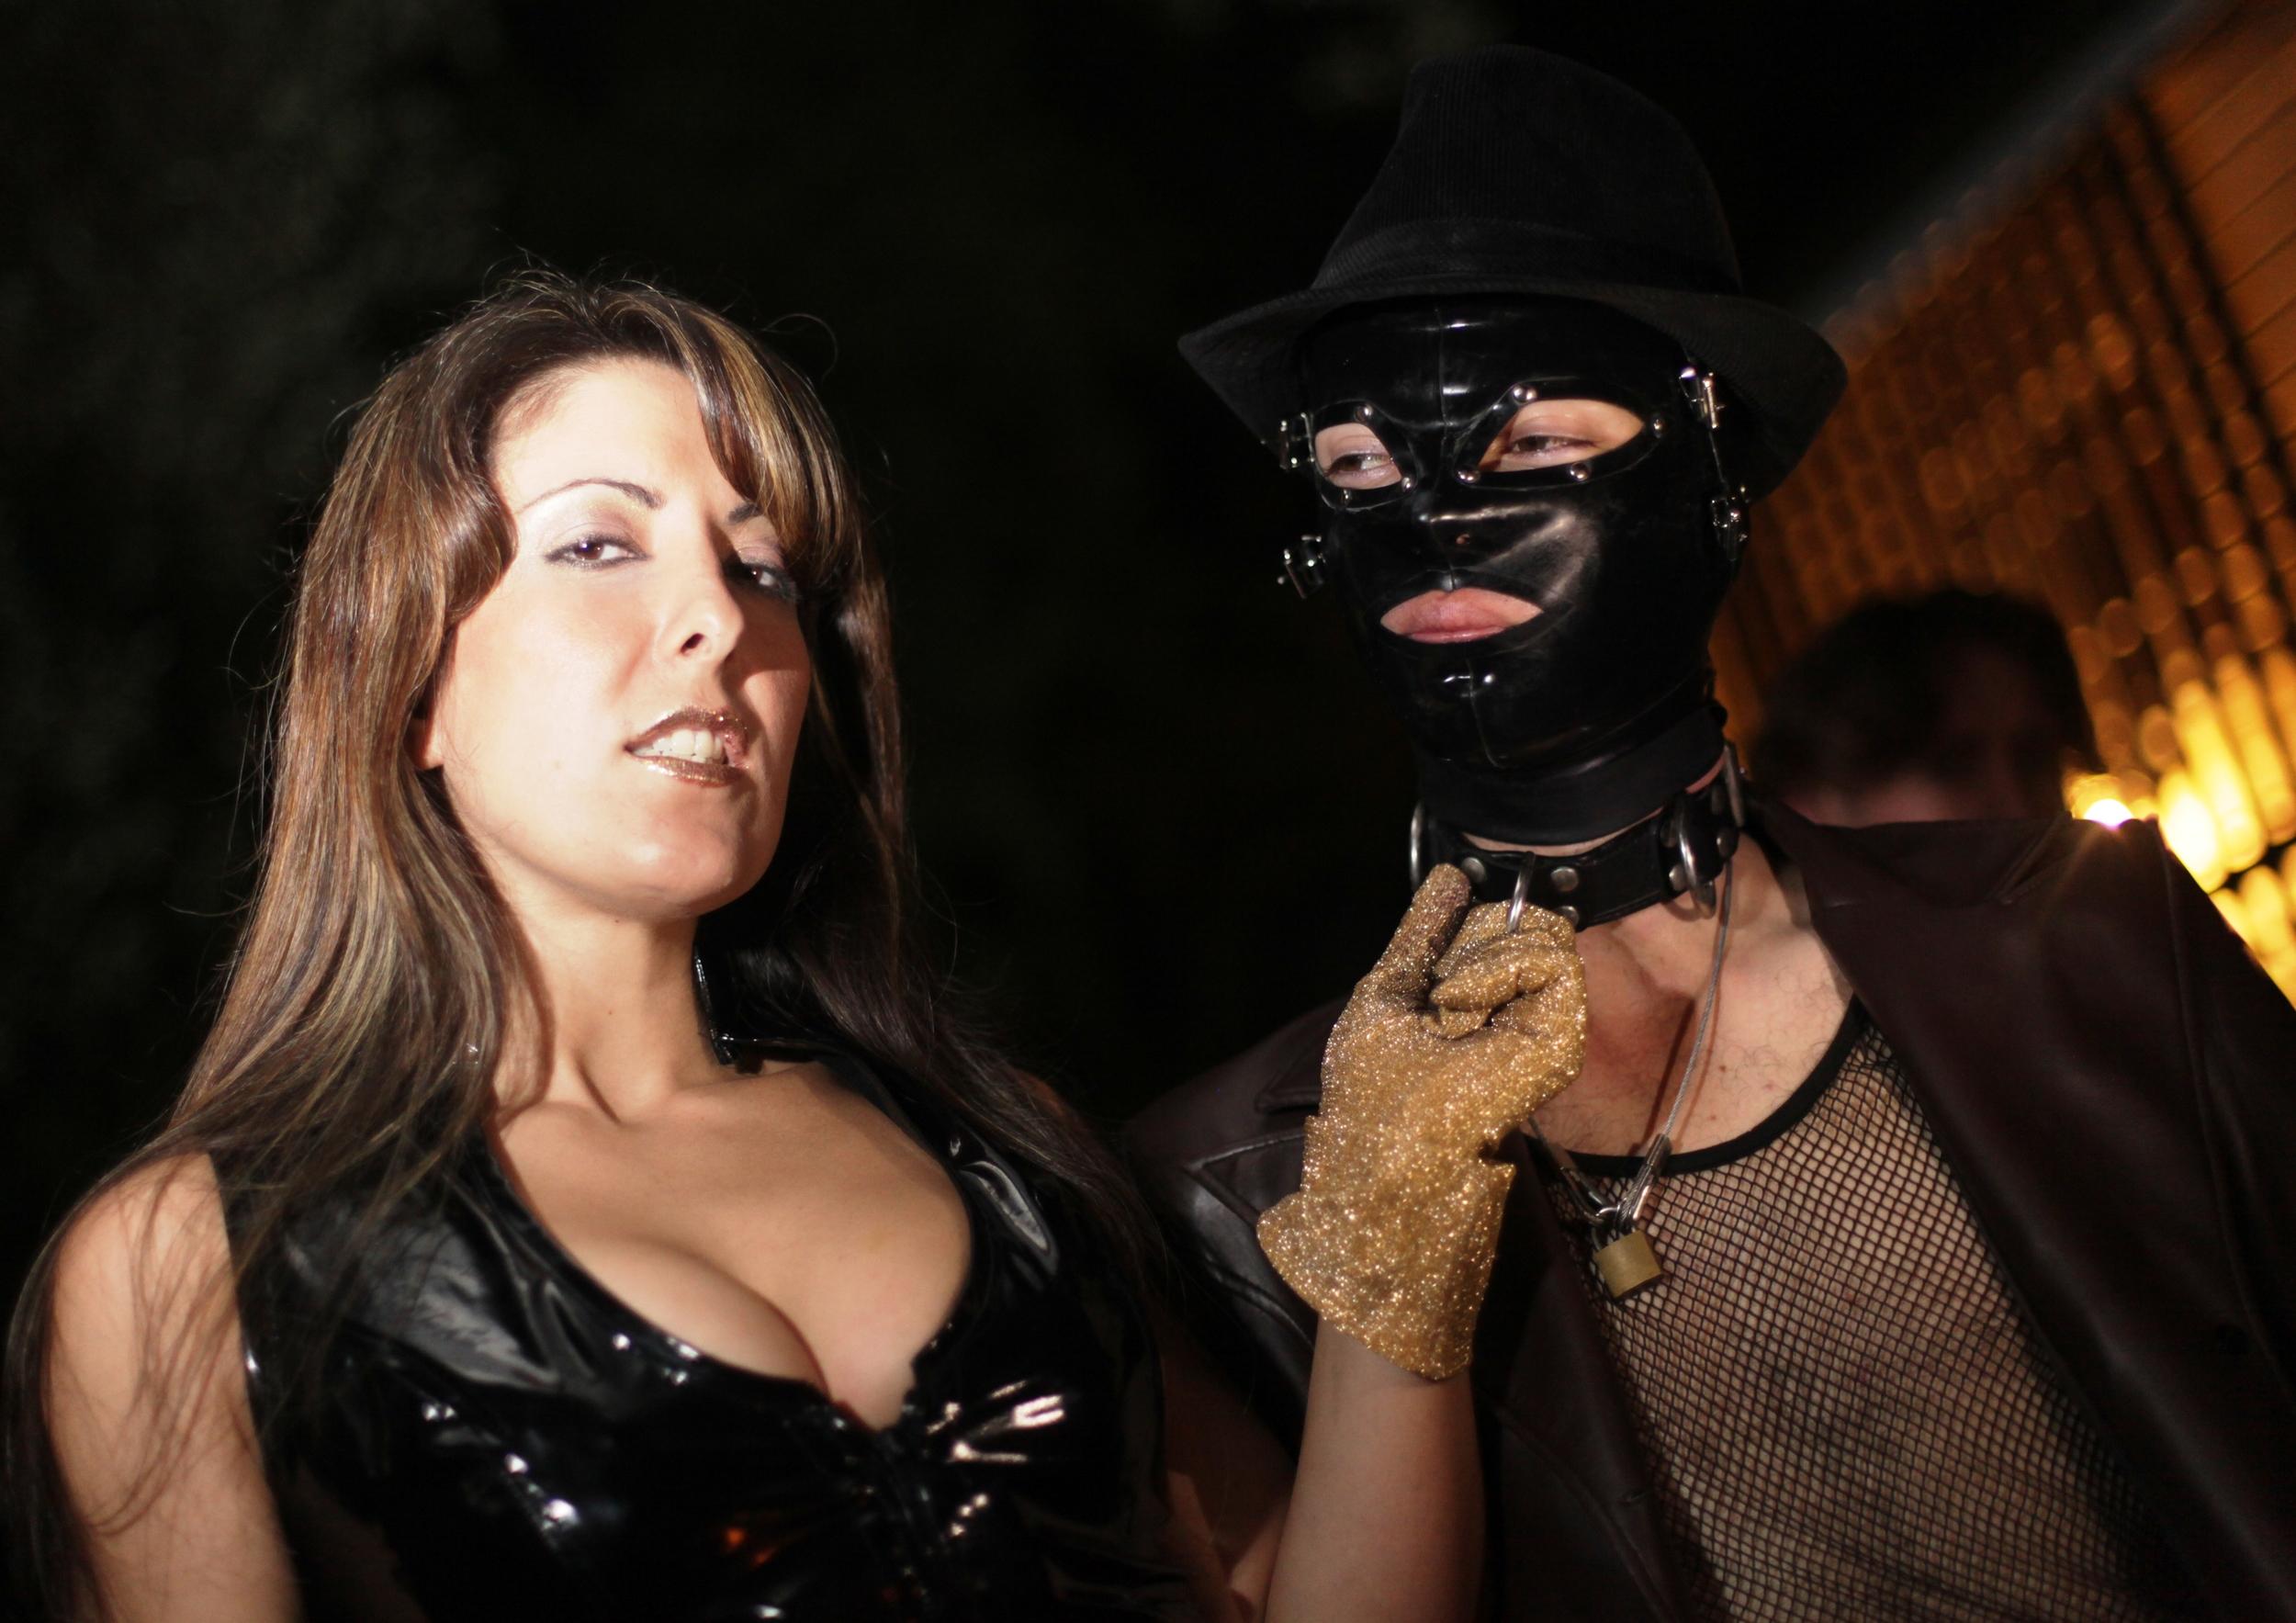 Mistress Kalyss Mercury and Mr Devastropic